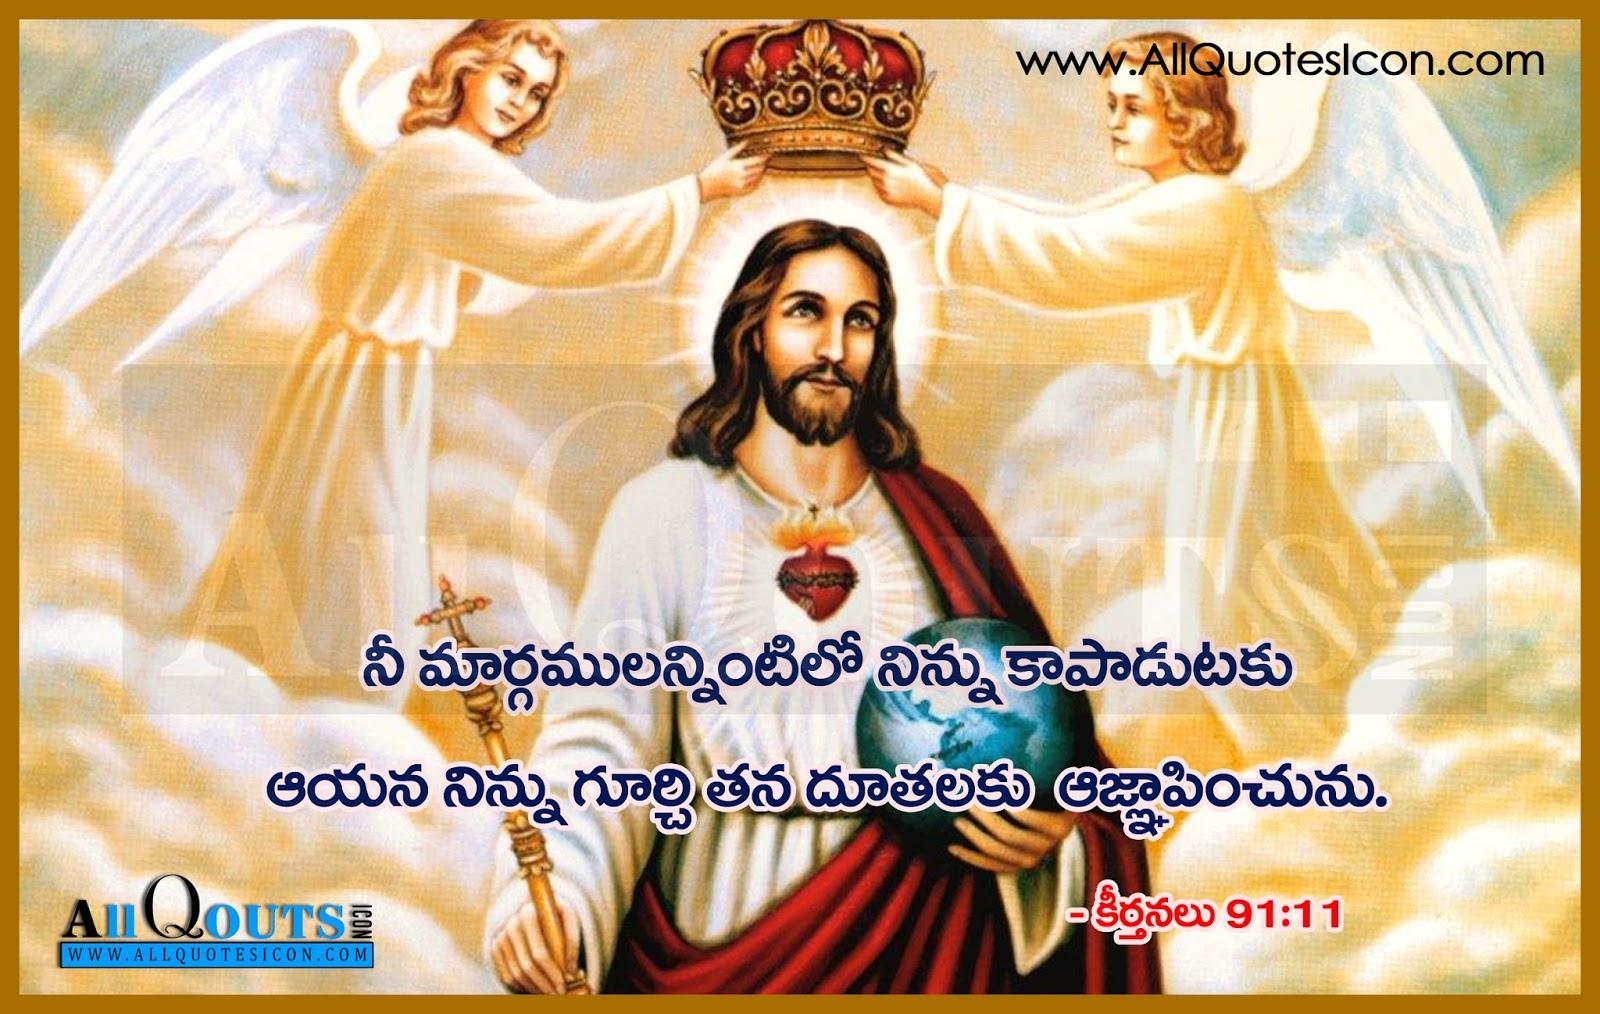 Blessings Follows You Best Bible Verses In Telugu Hd Wallpapers Best